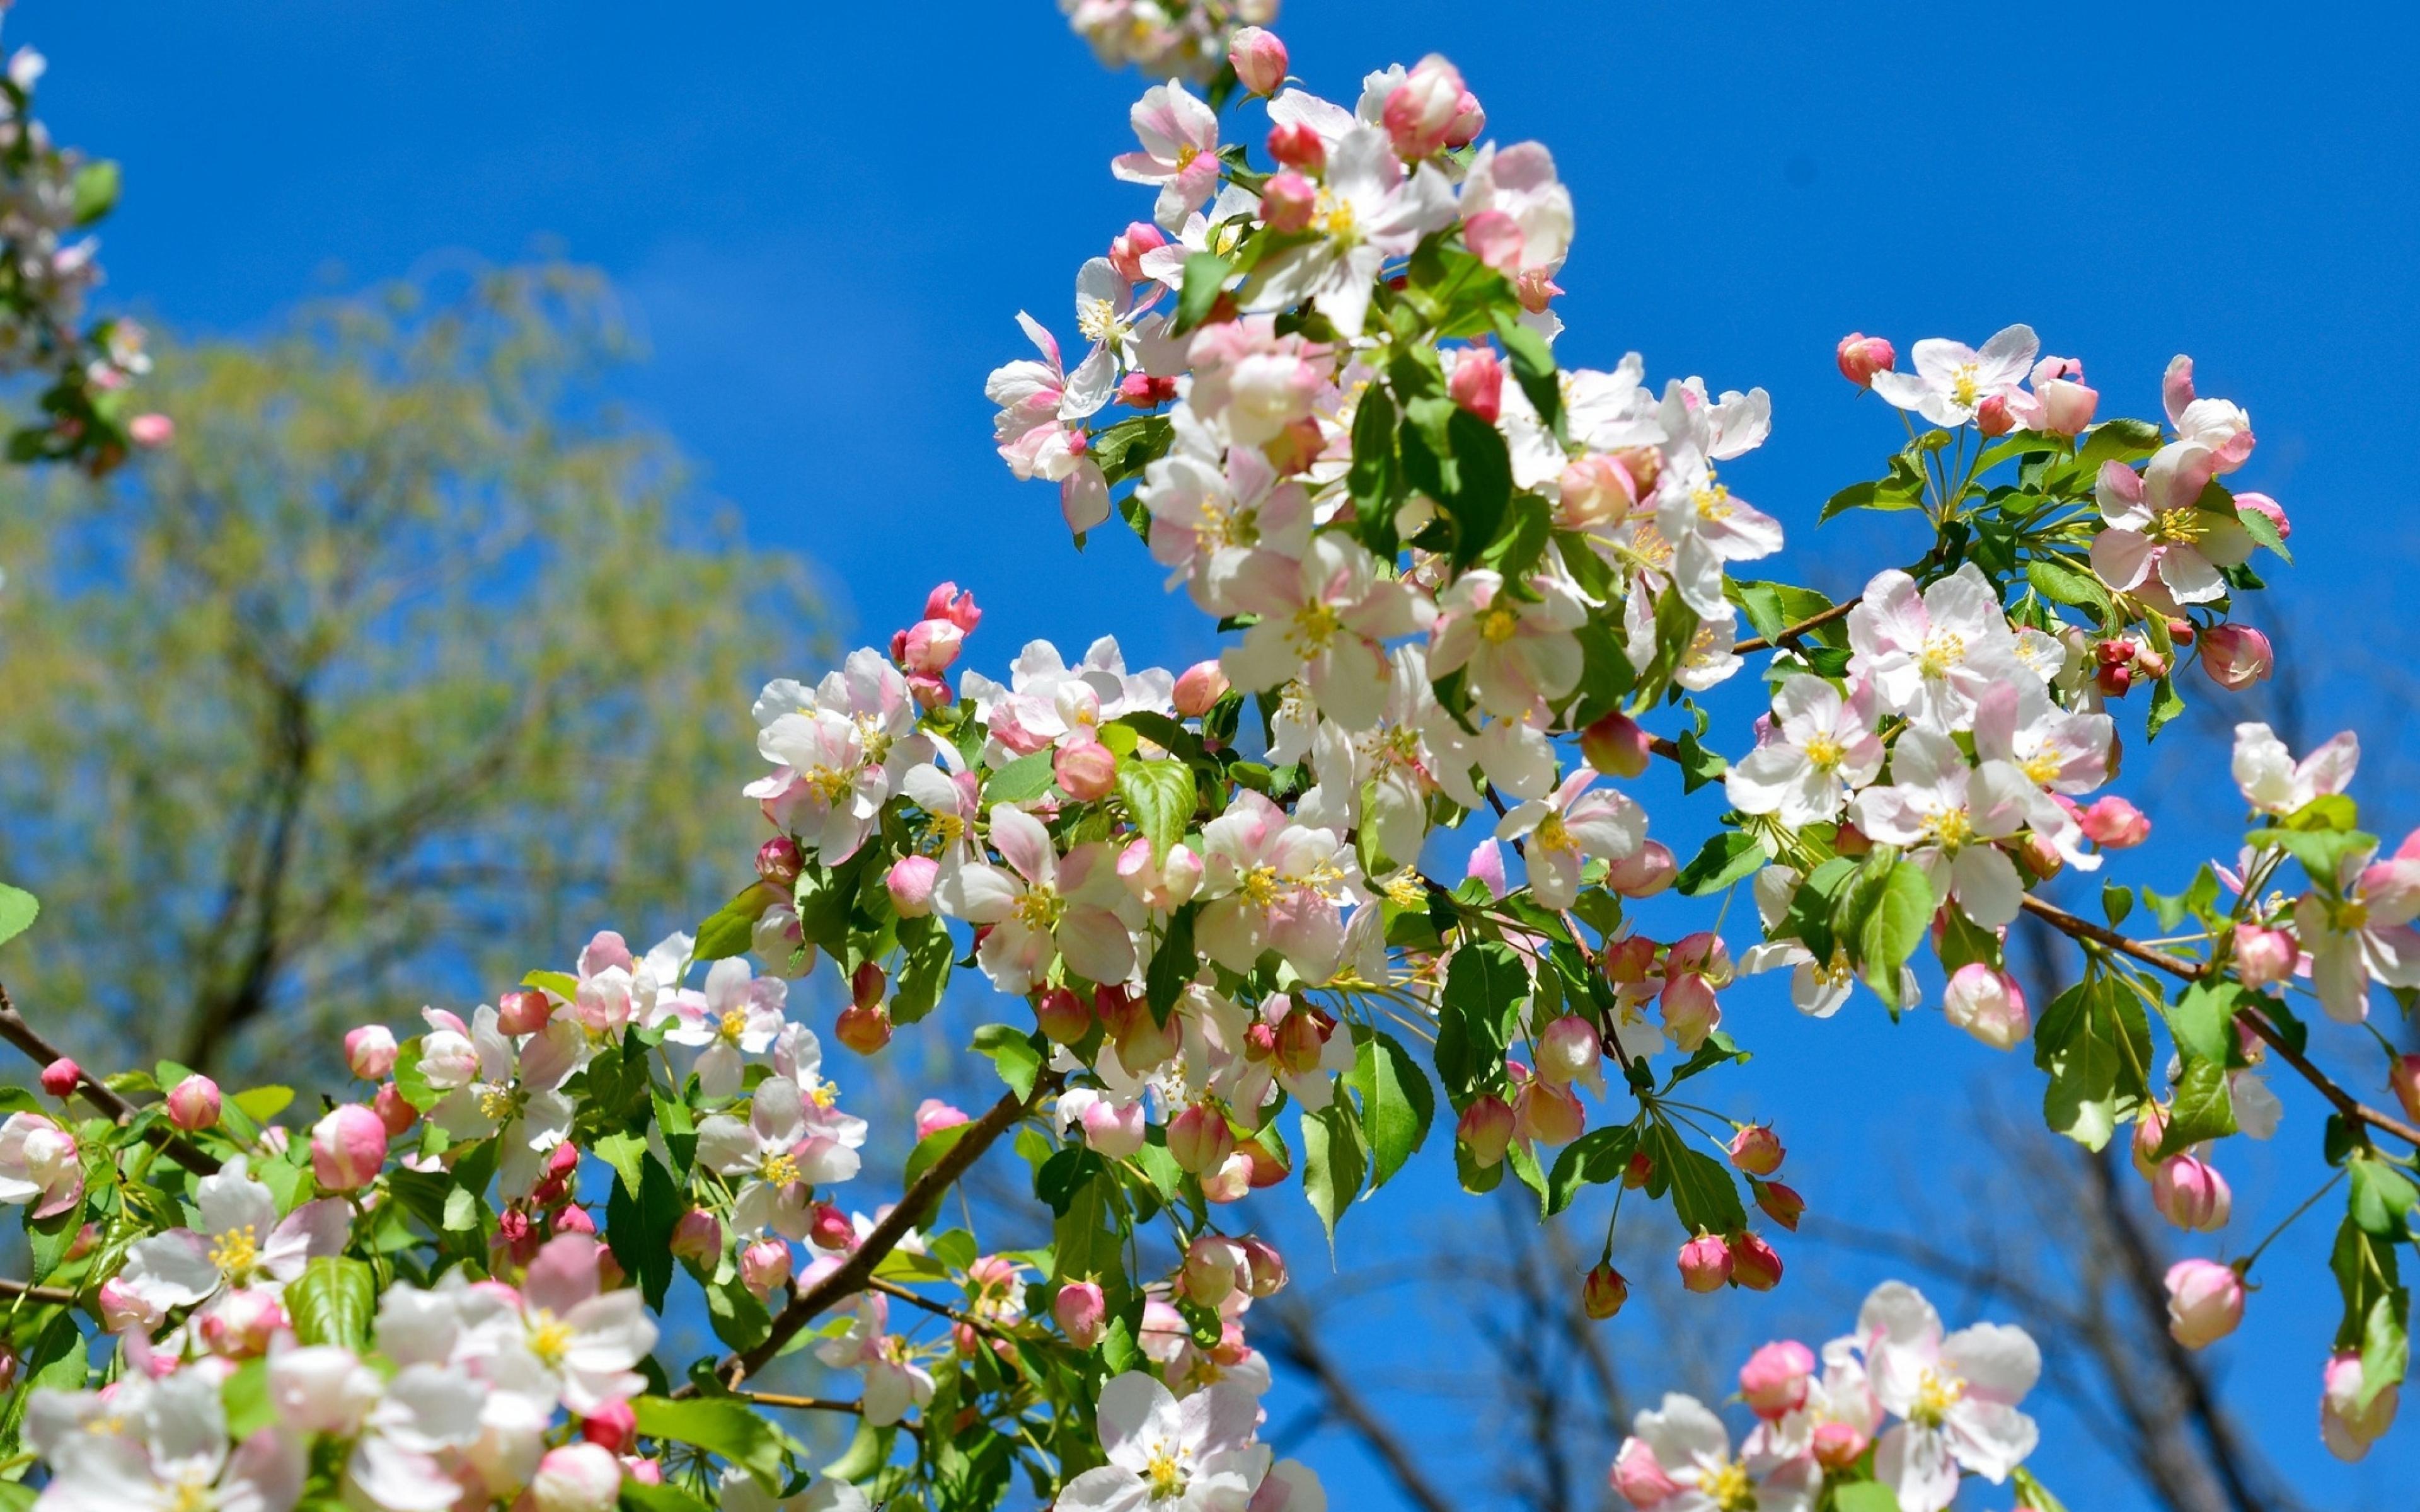 spring wallpaper free - HD1600×1060